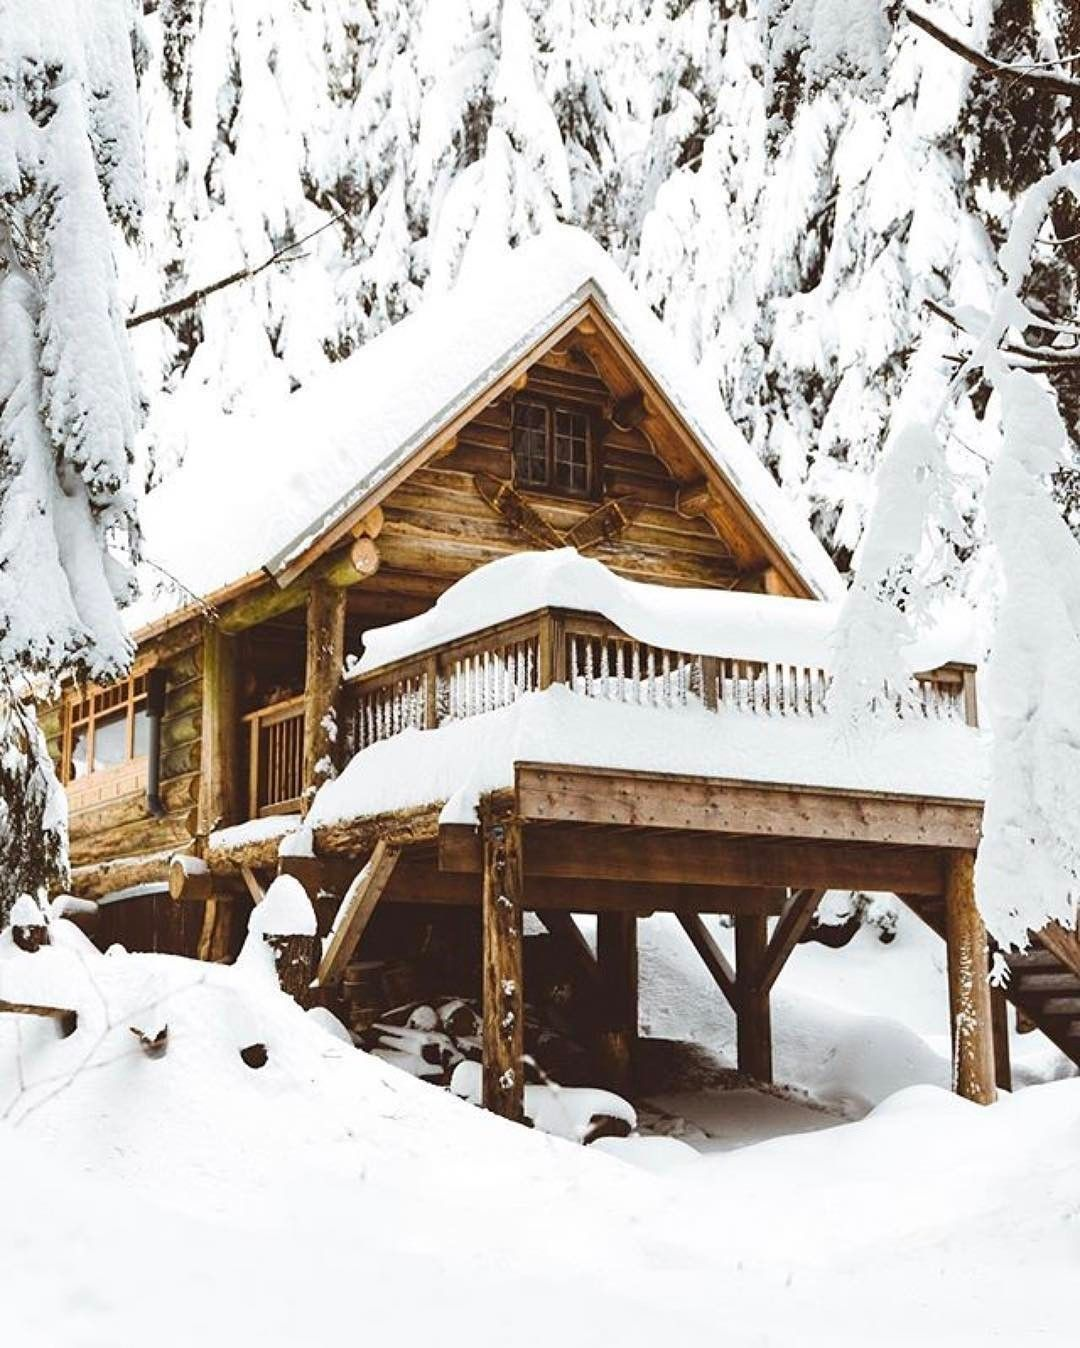 Log Cabin Designs Fryeburg Maine: Cabins Daily : Photo